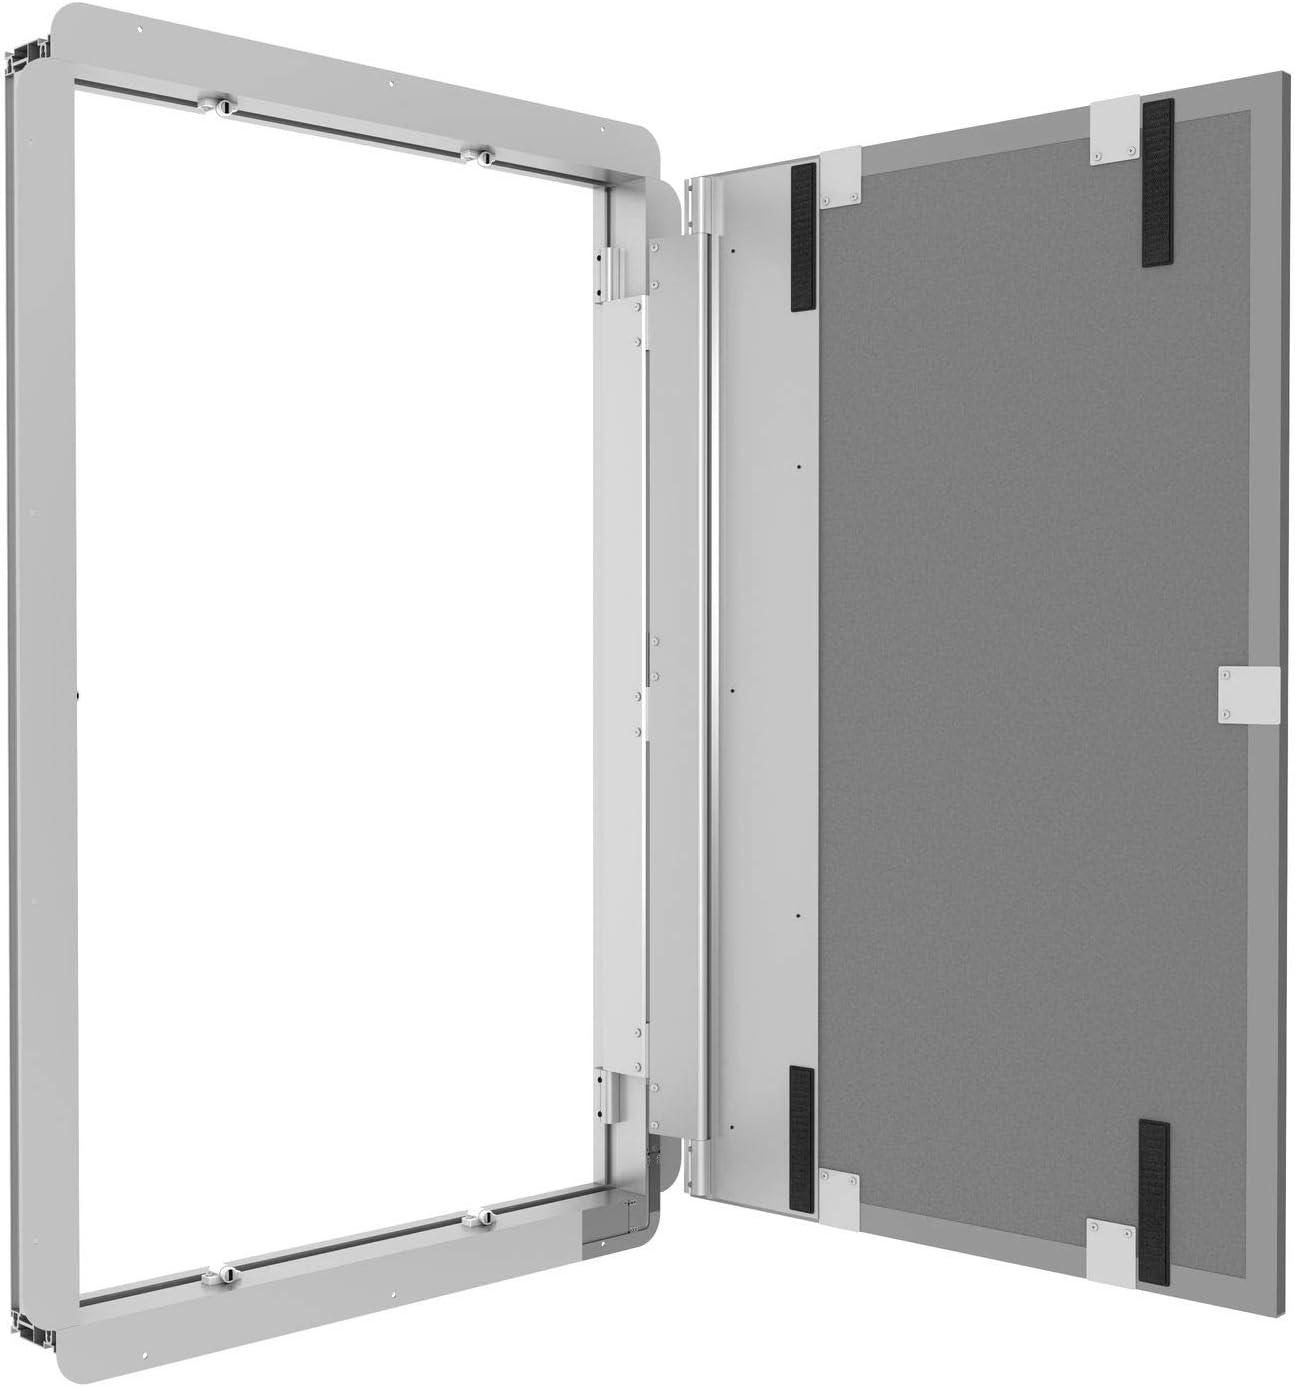 Profesional pladur Tapa para revisión patentado para puerta ...